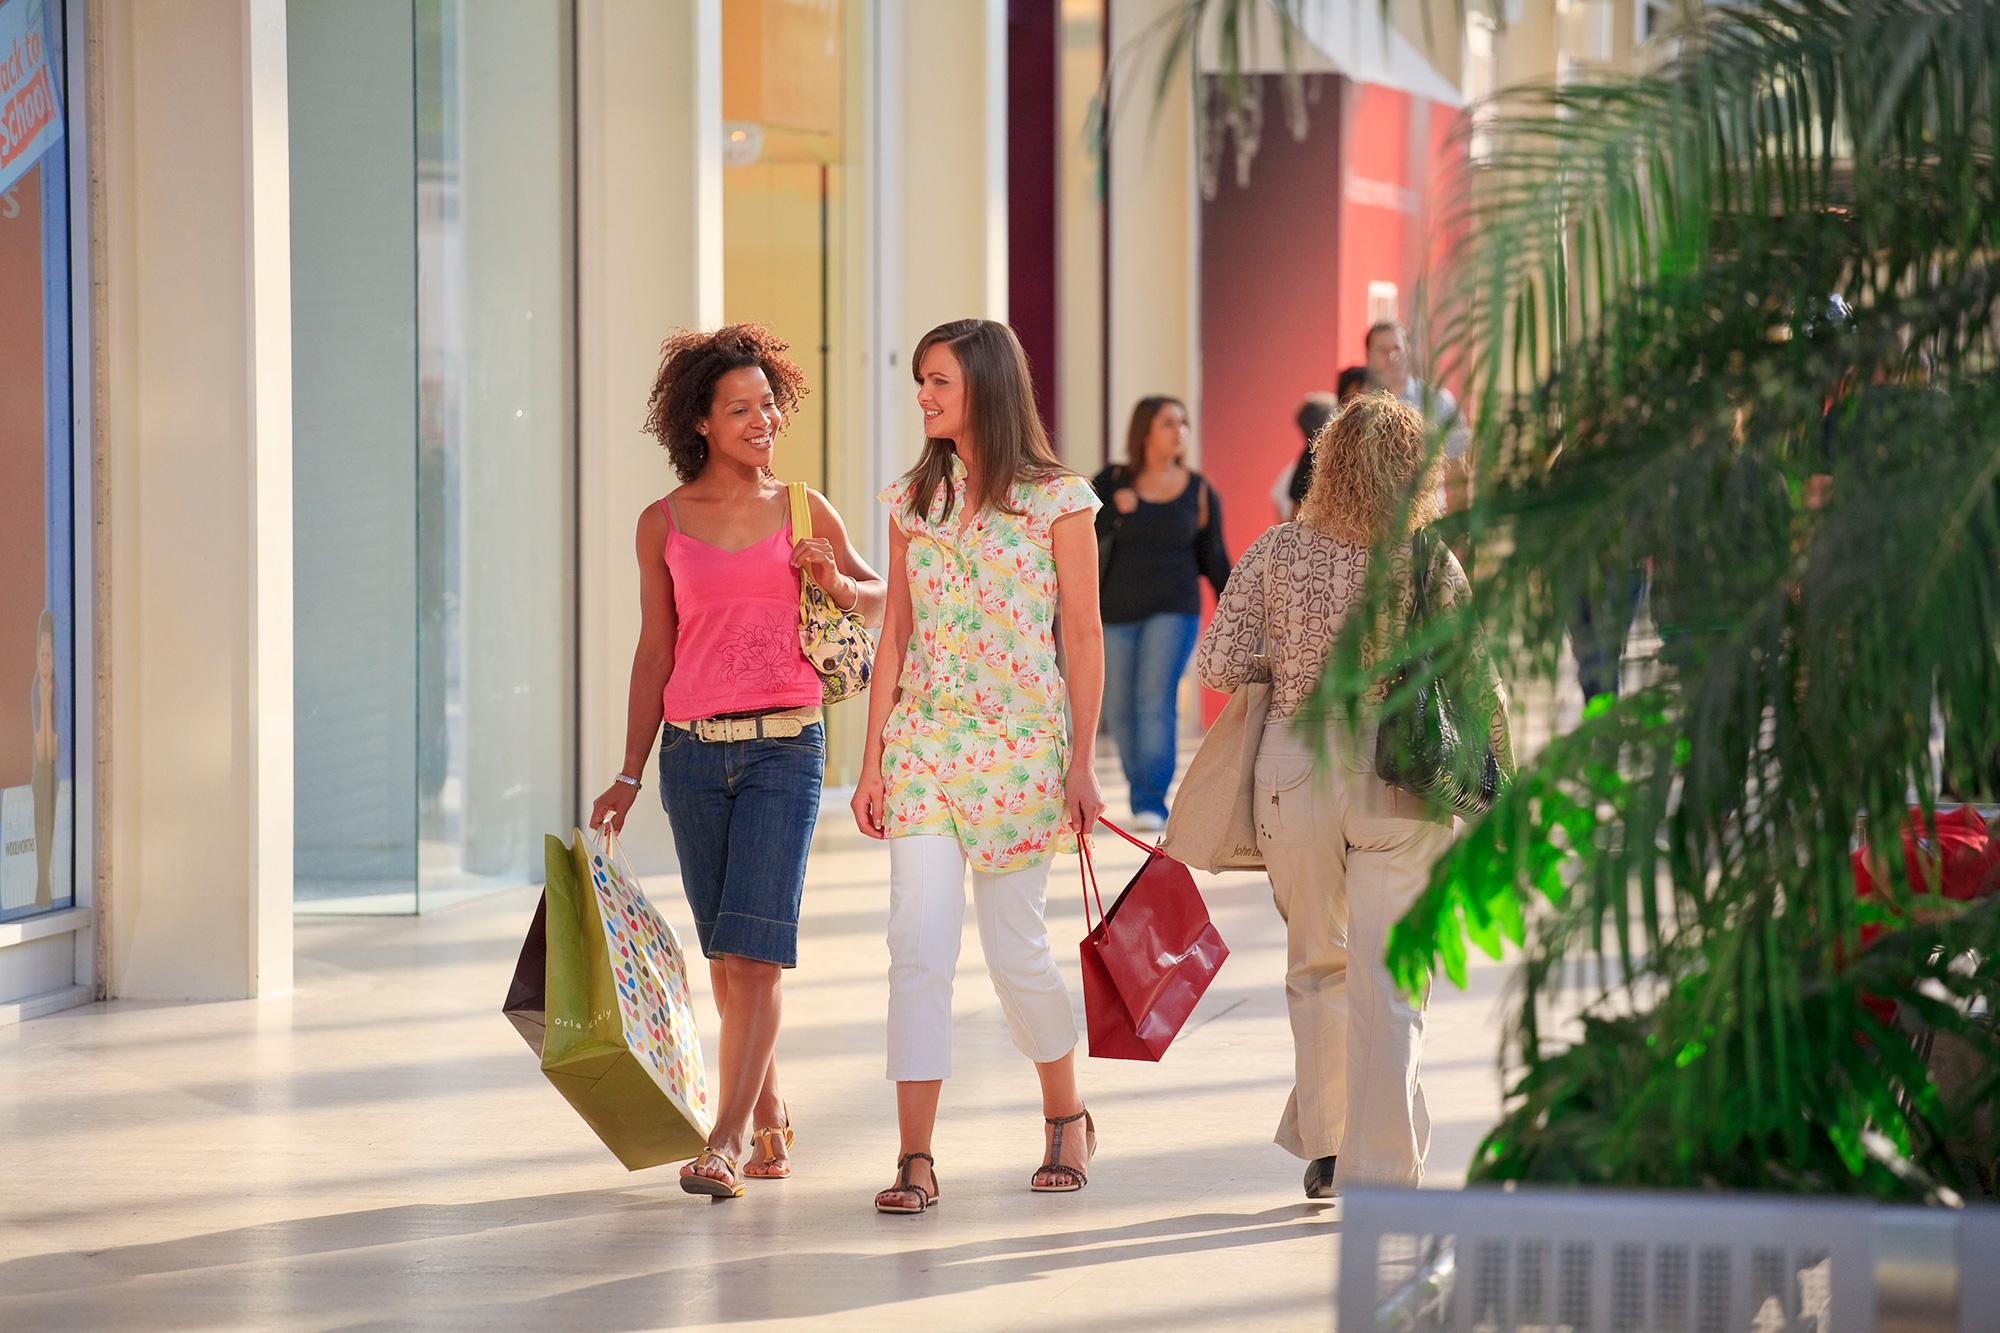 milton-keynes-shopping-centre.jpg